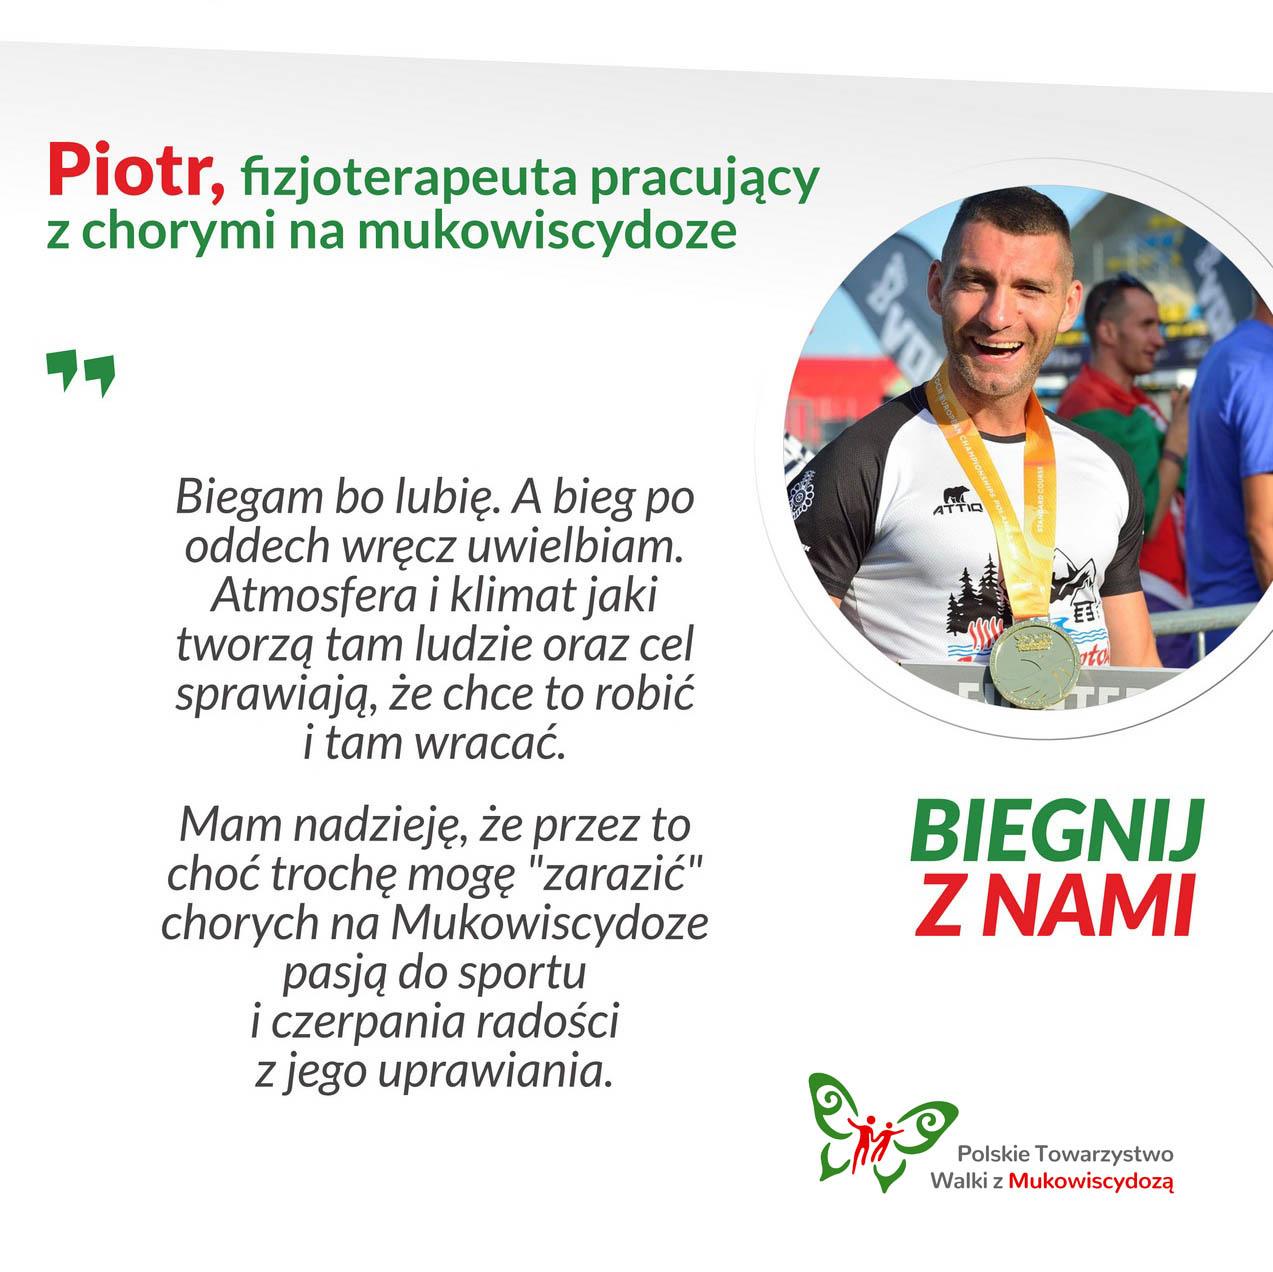 Piotr, fizjoterapeuta